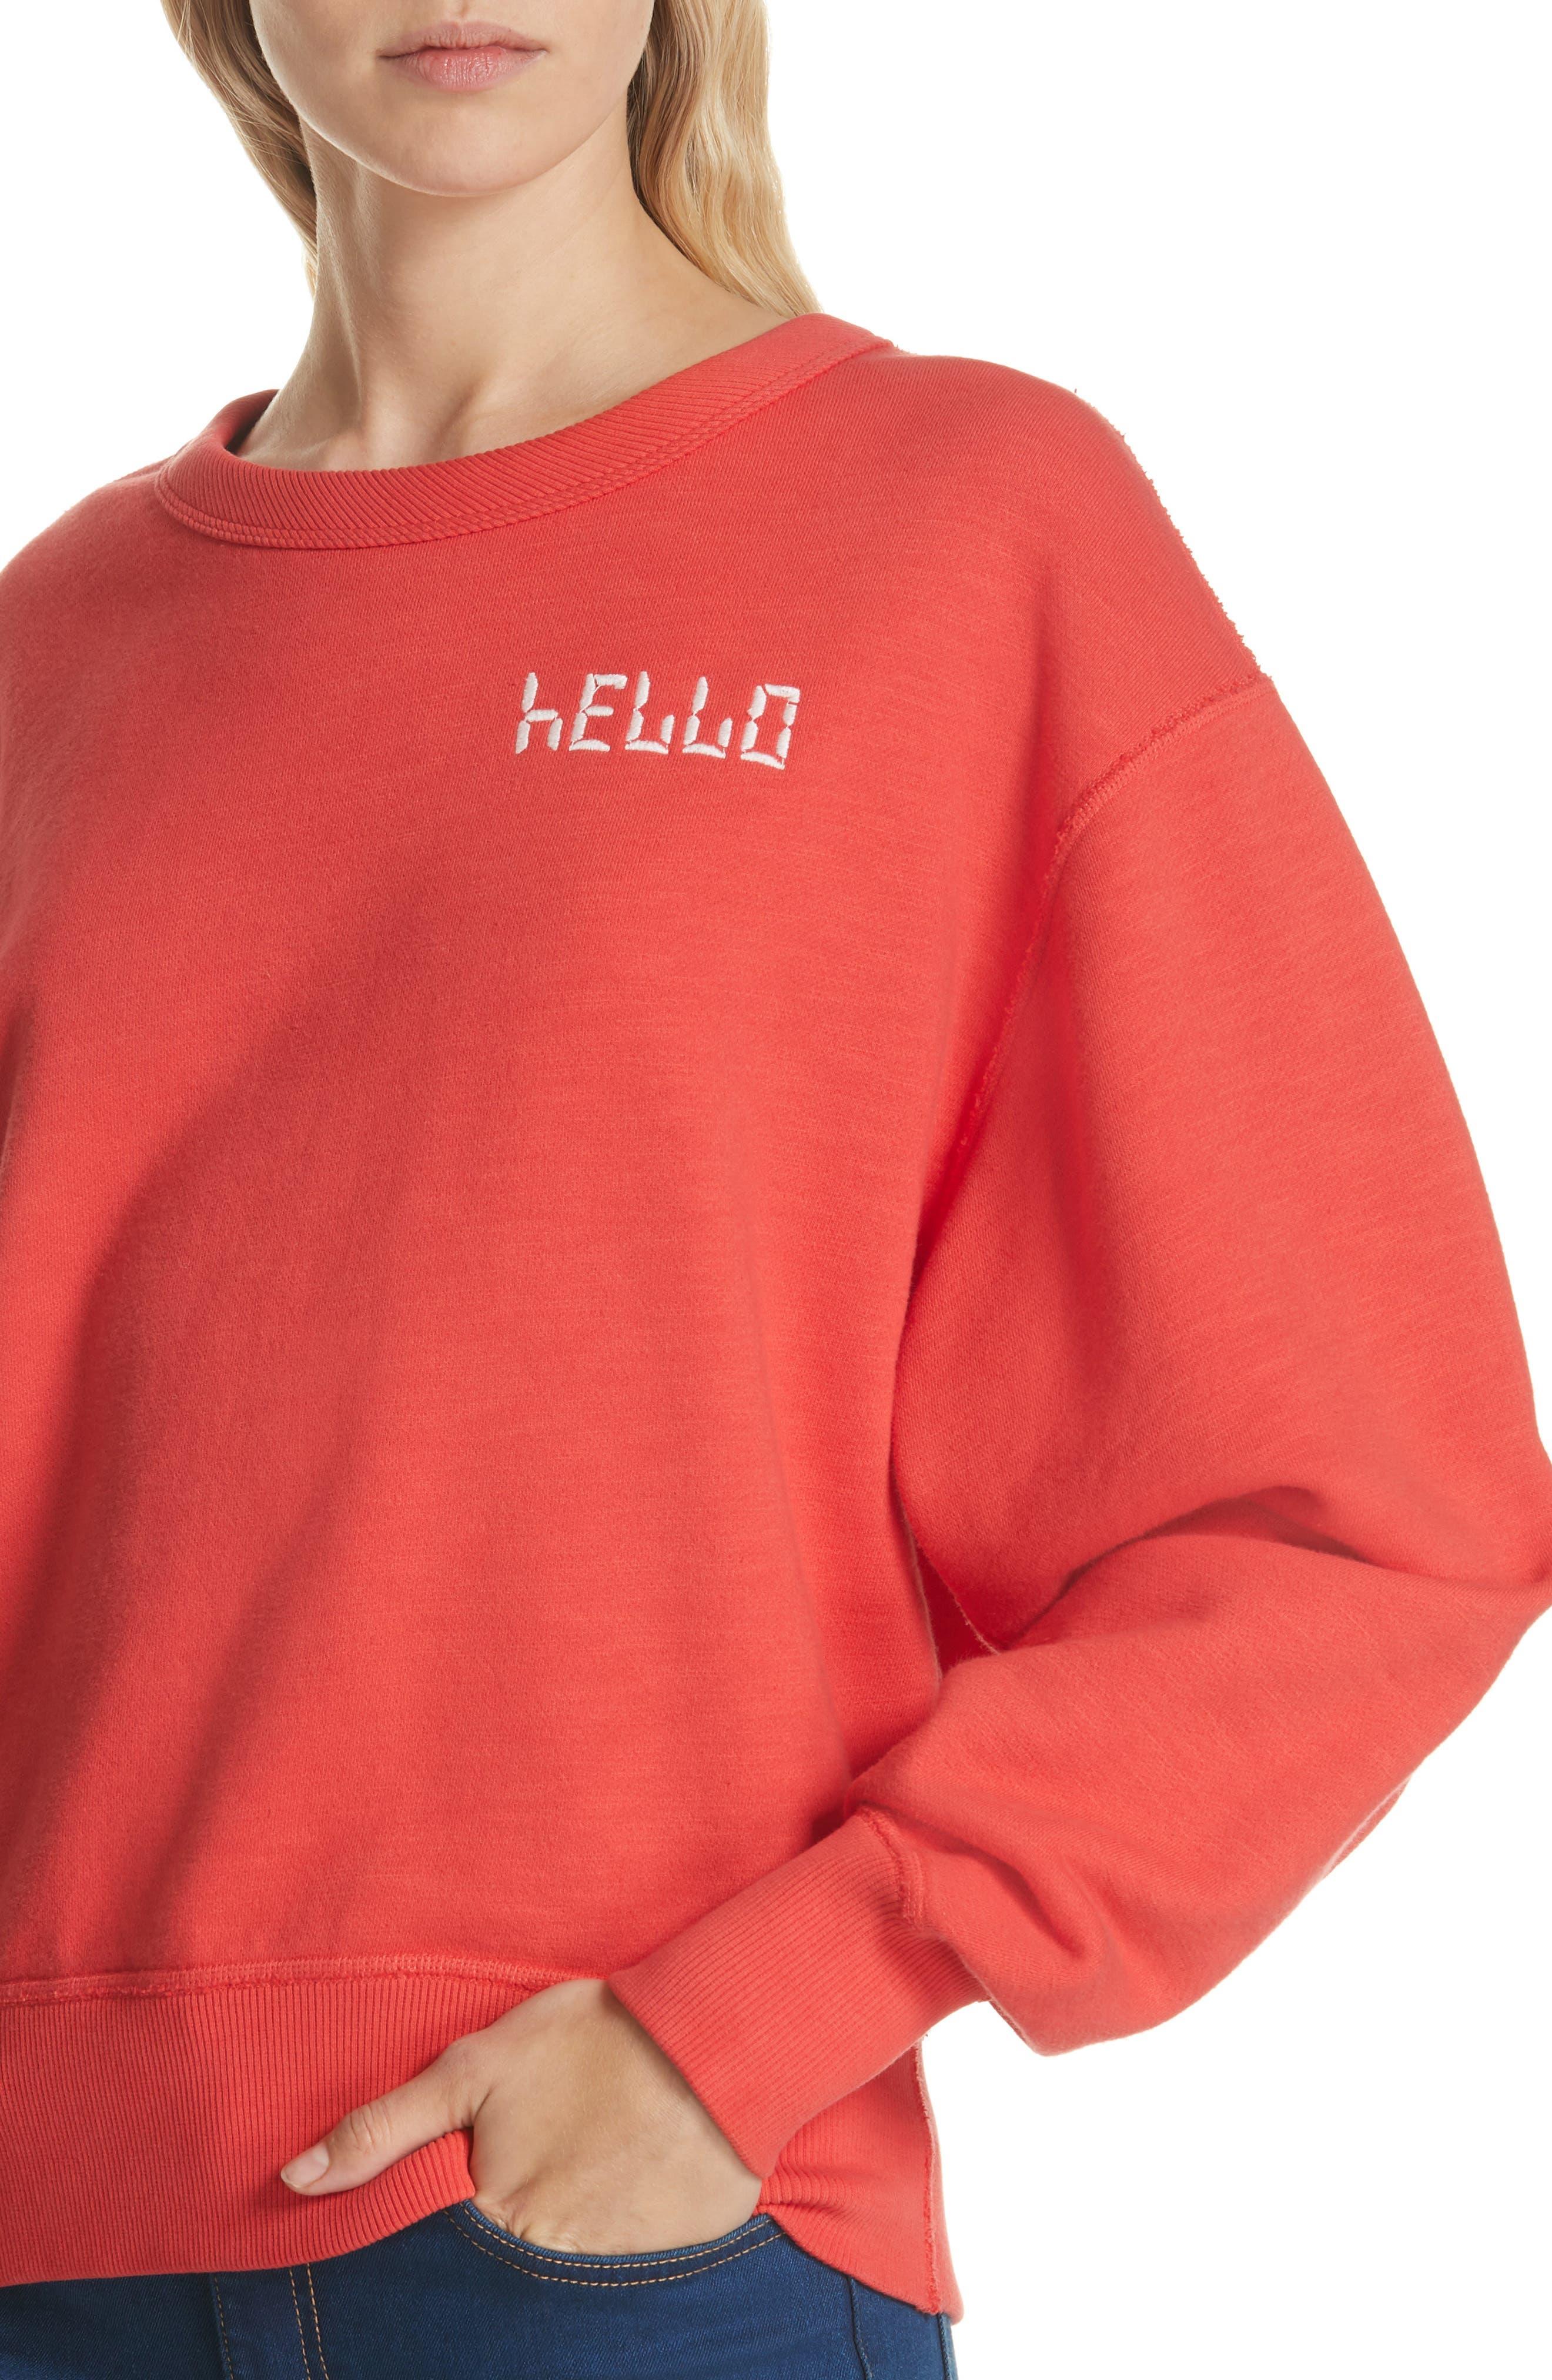 rag & bone Hello Sweatshirt,                             Alternate thumbnail 4, color,                             950